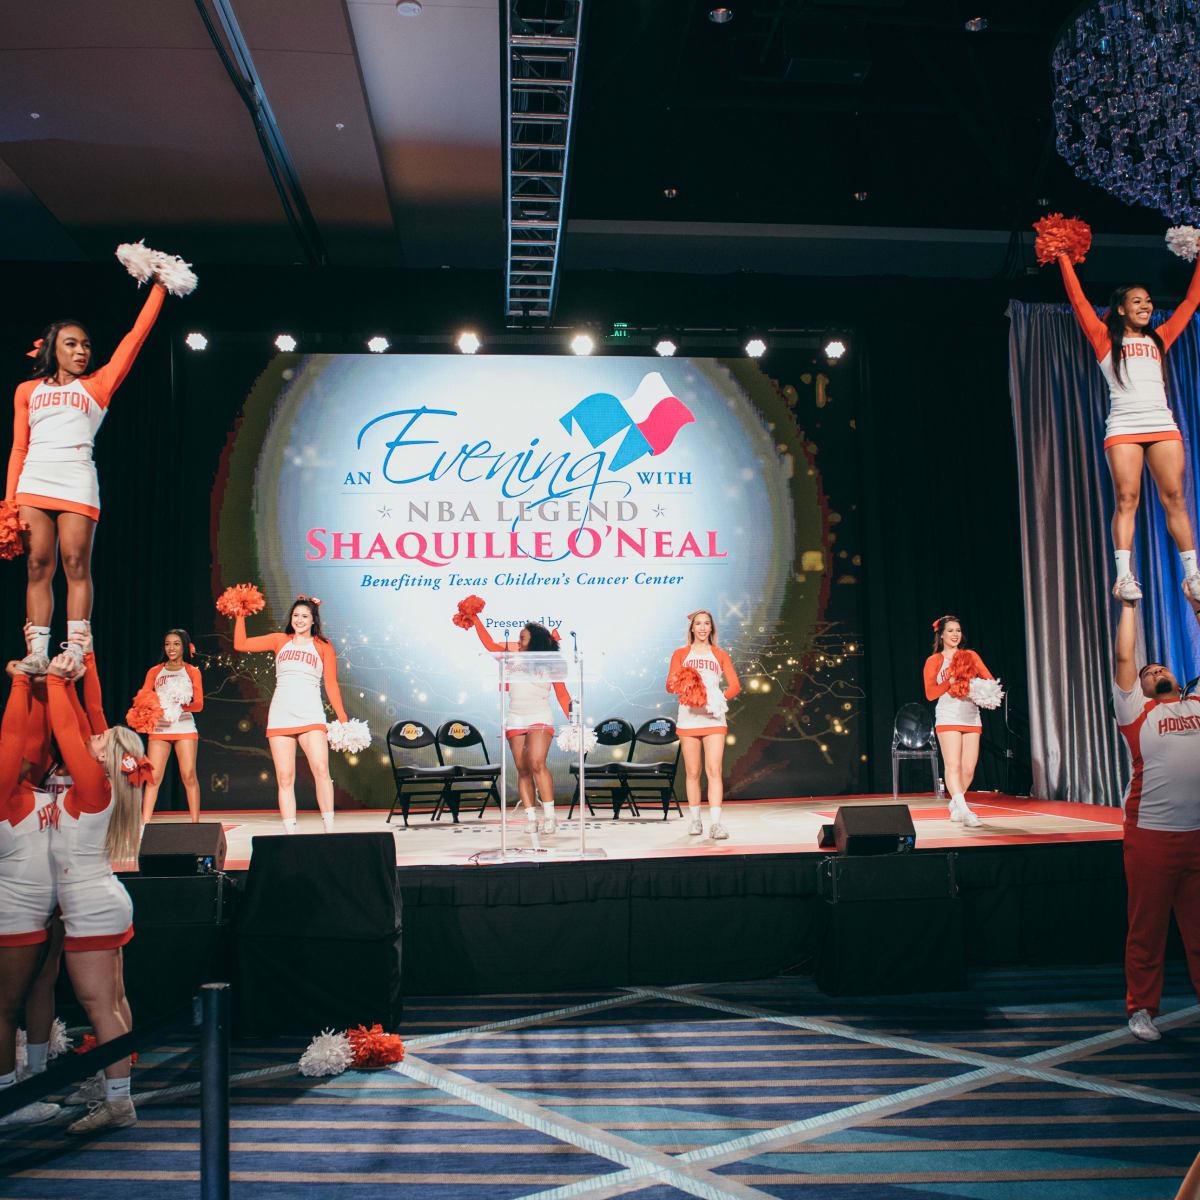 Shaquile O' Neal UH cheerleaders